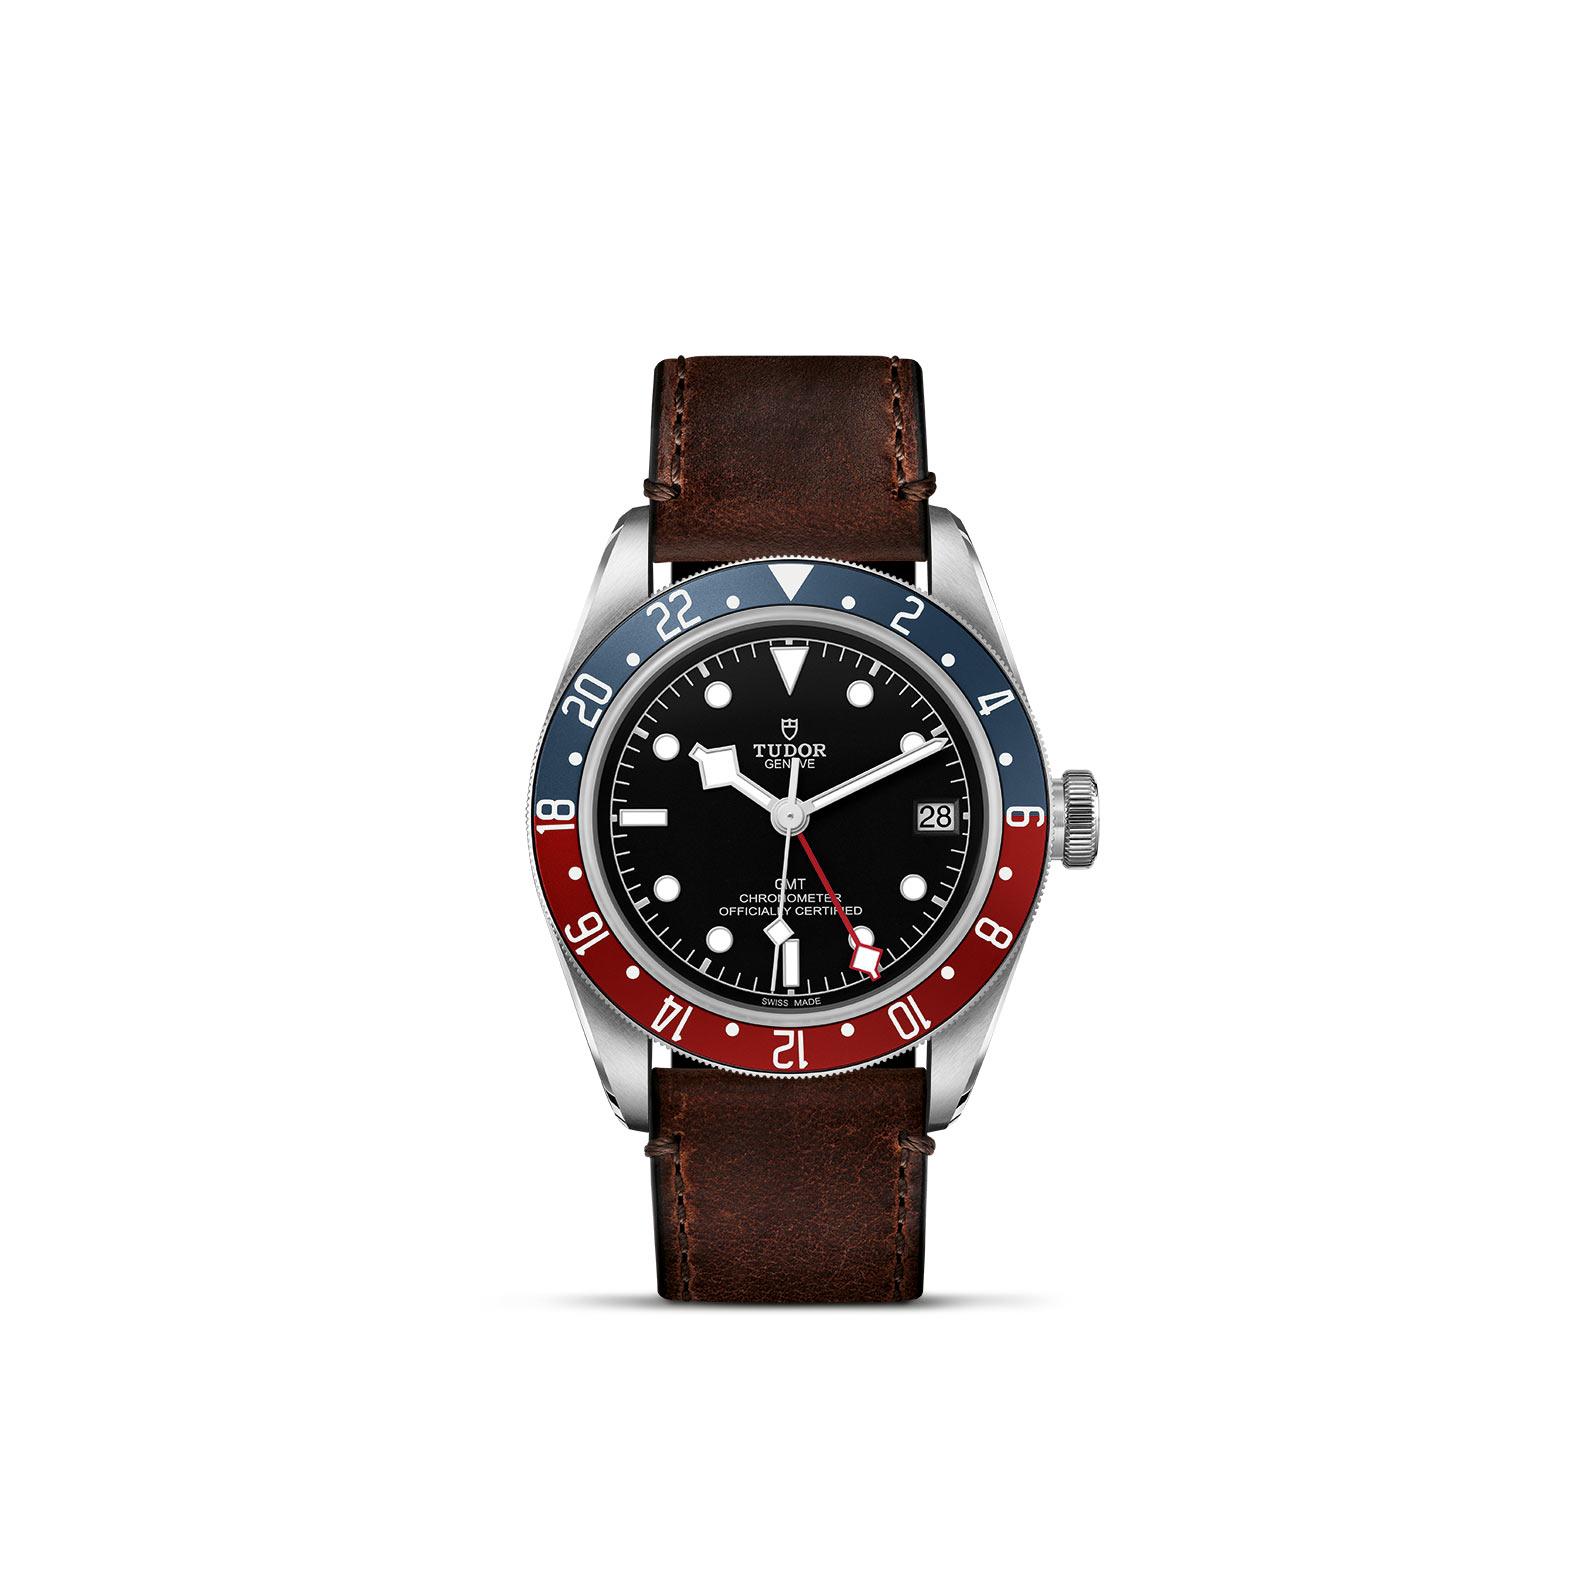 TUDOR Black Bay GMT M79830RB 0002 Upright